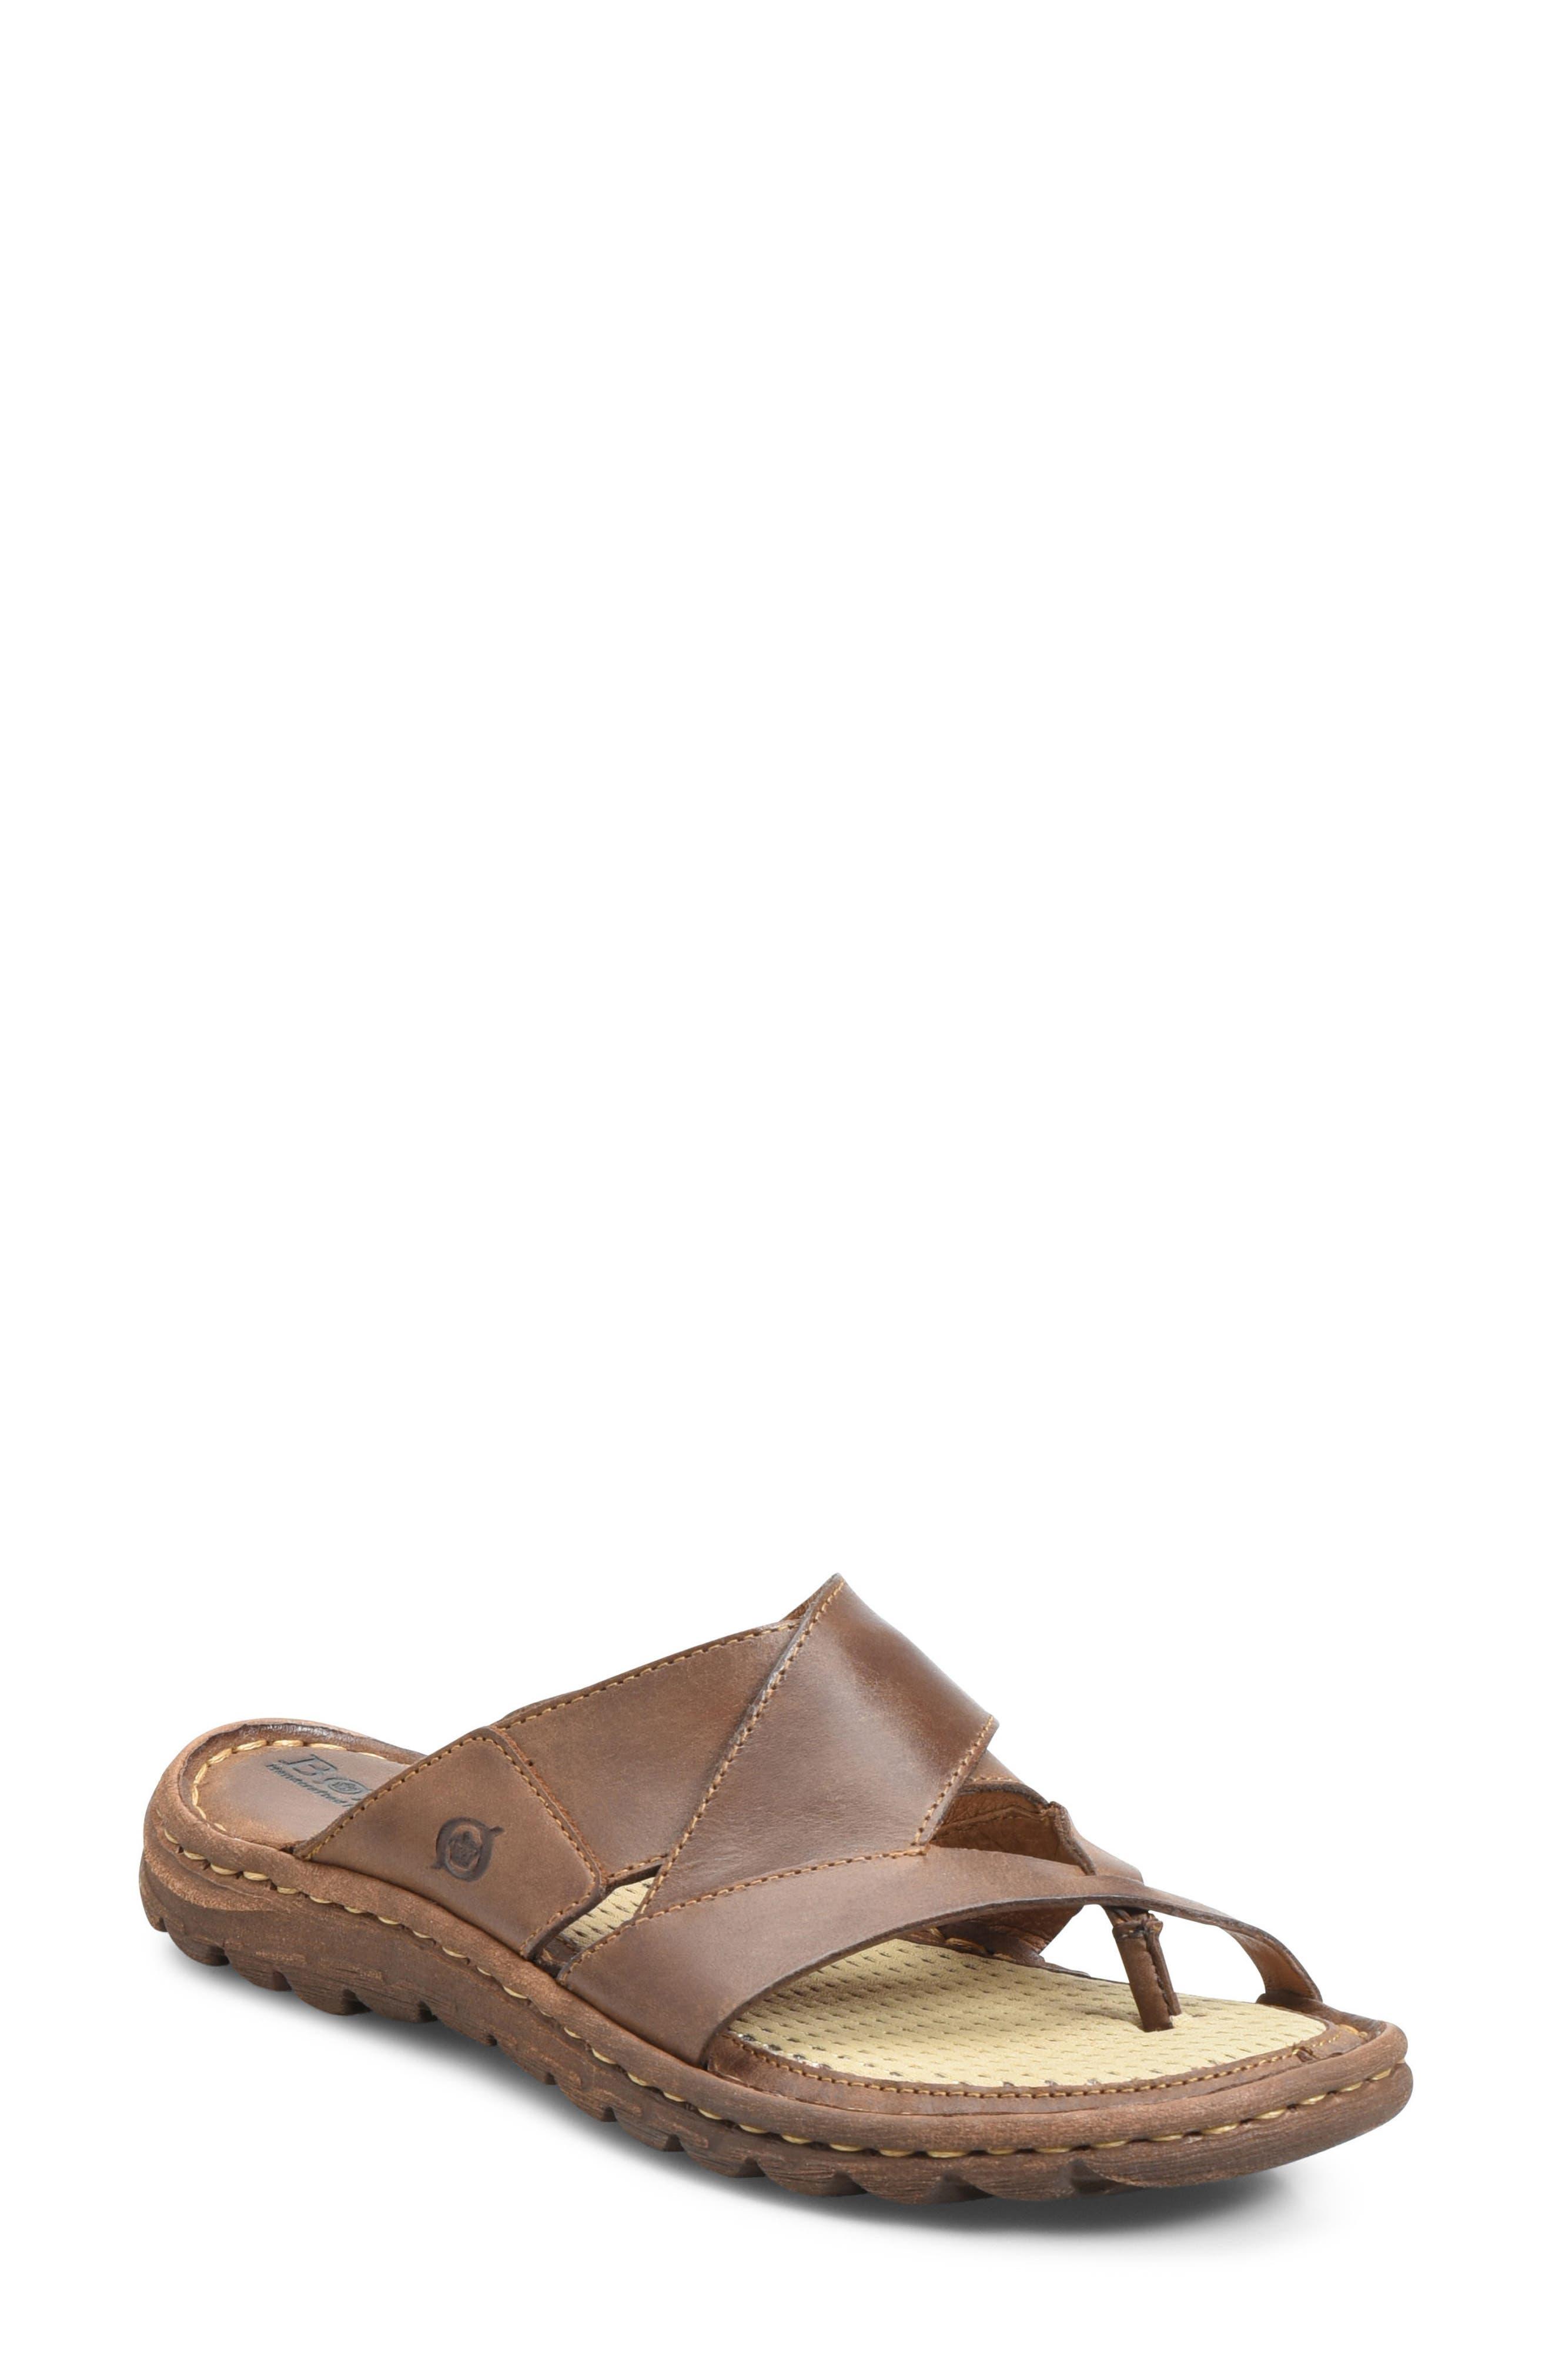 'Sorja' Leather Sandal,                             Main thumbnail 1, color,                             Dark Brown Leather